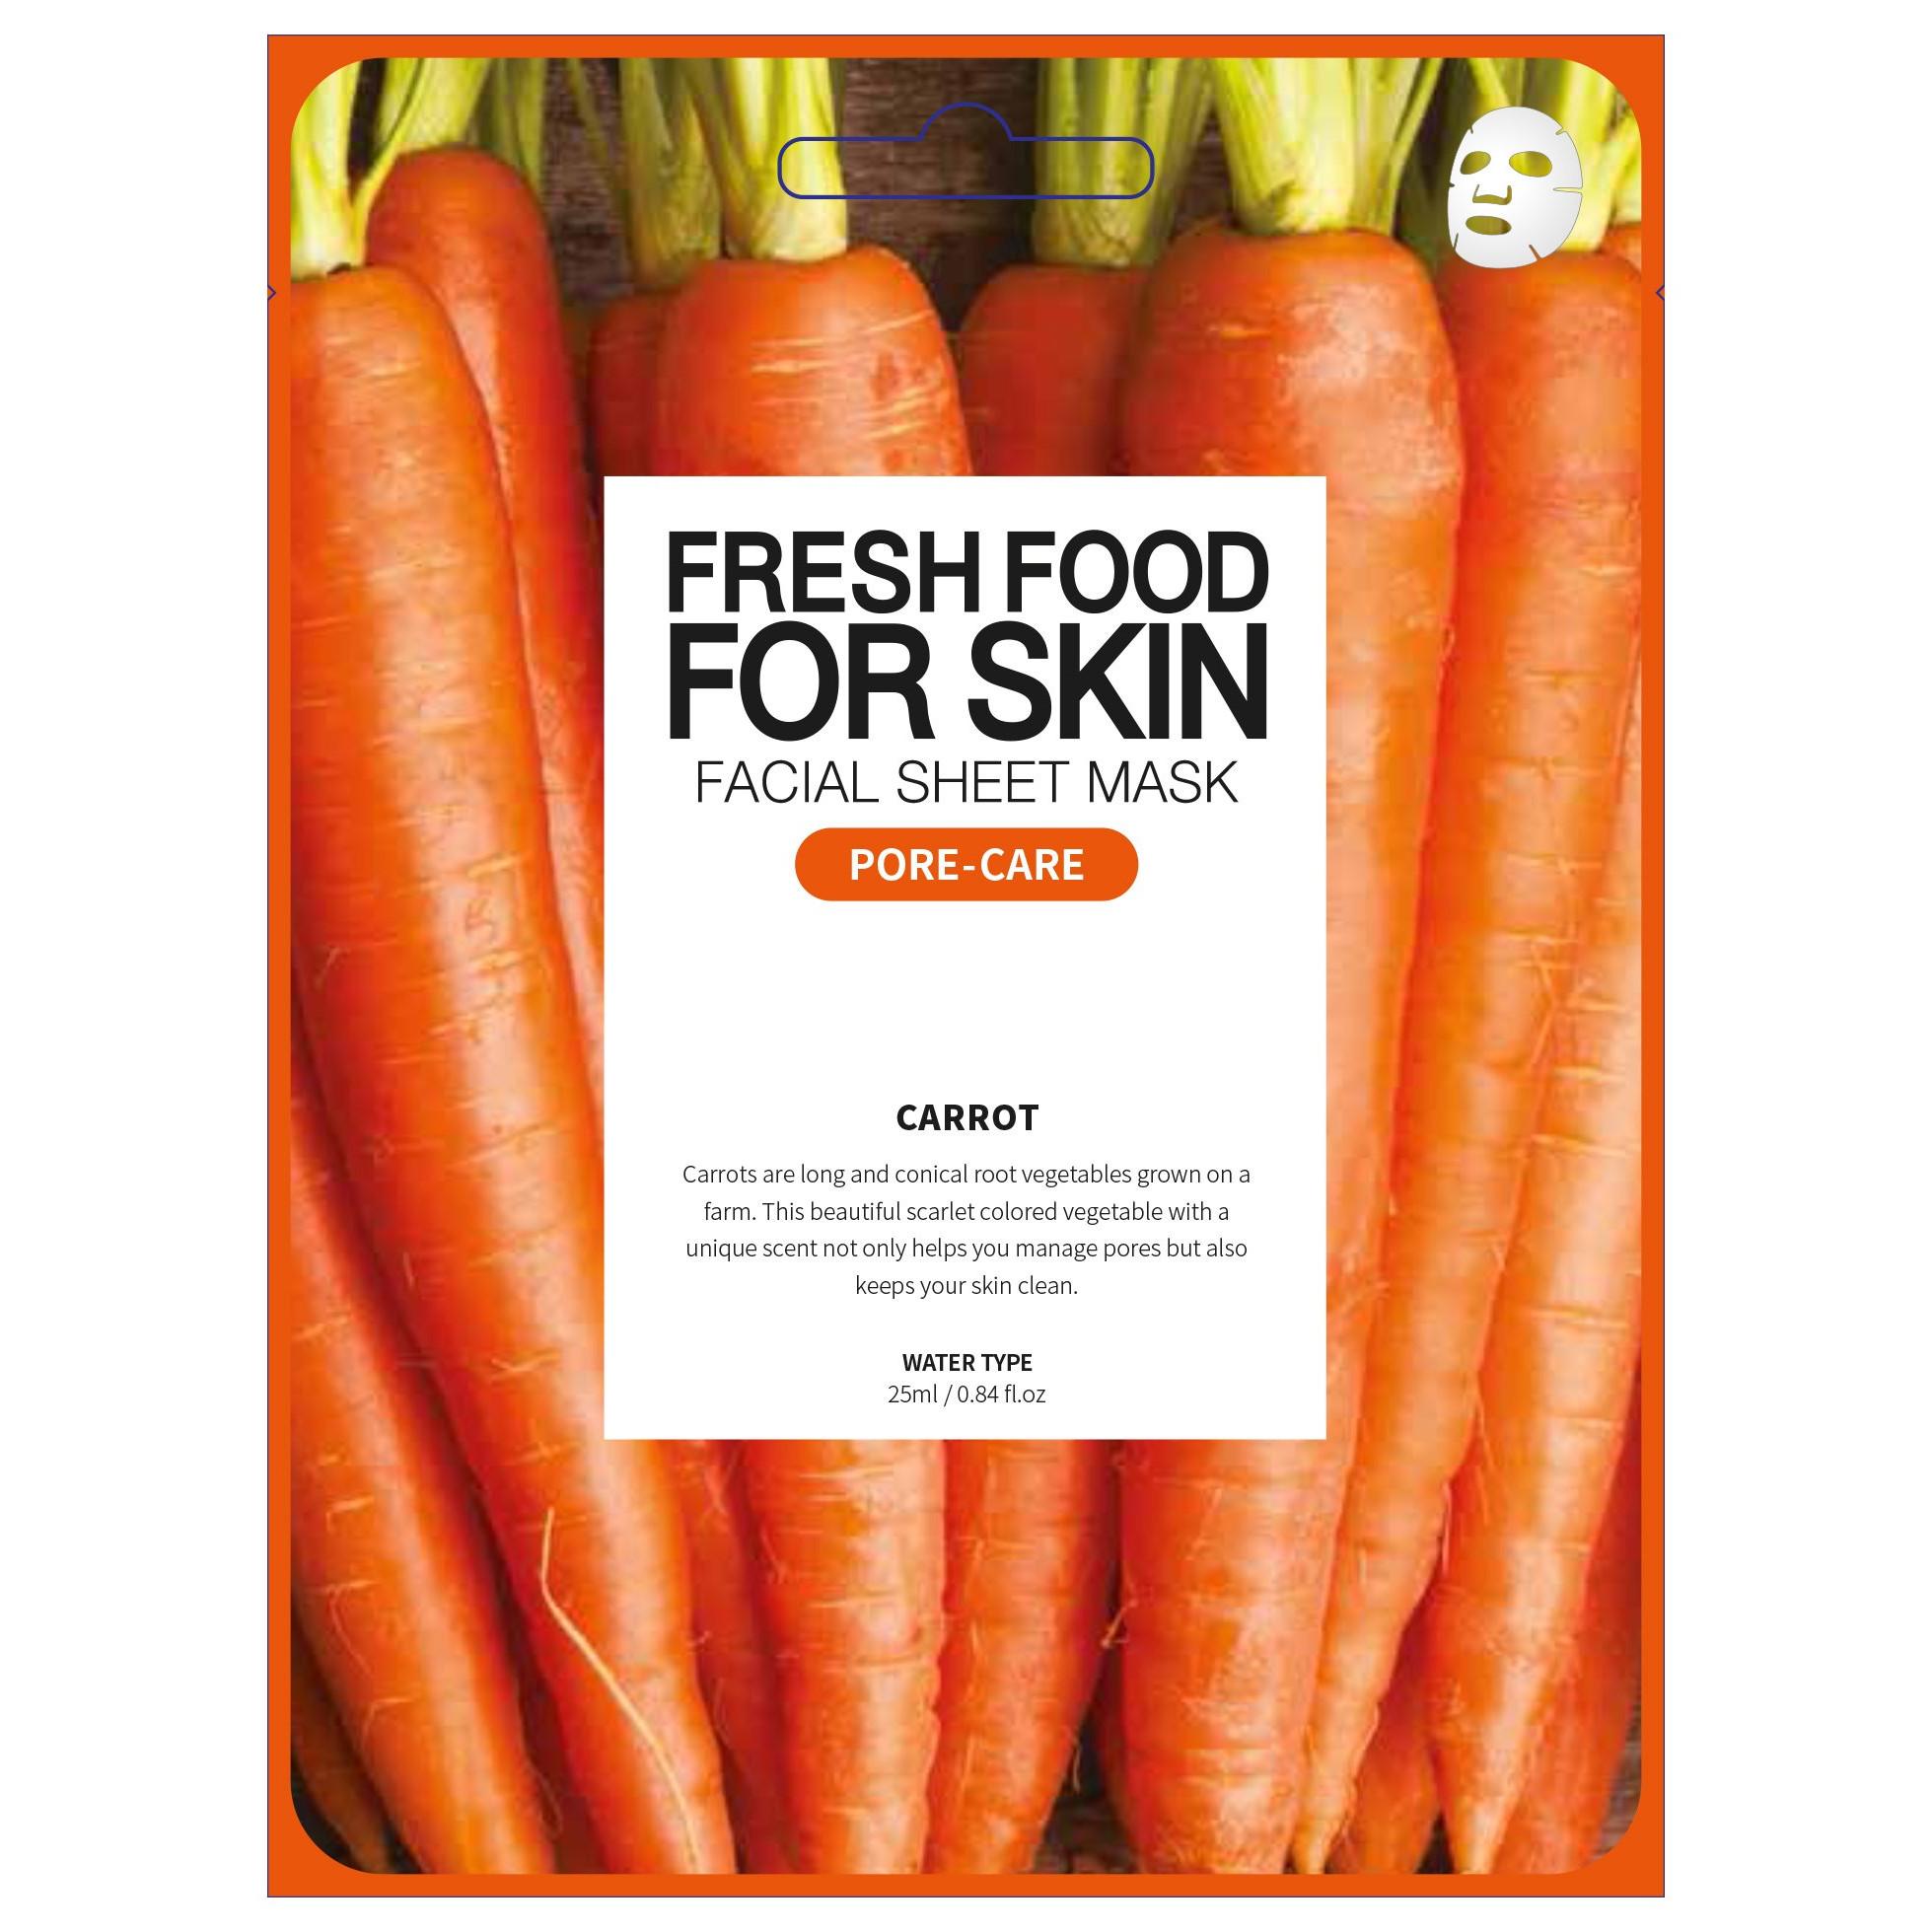 Mặt nạ dưỡng da Fresh Food For Skin 25ml